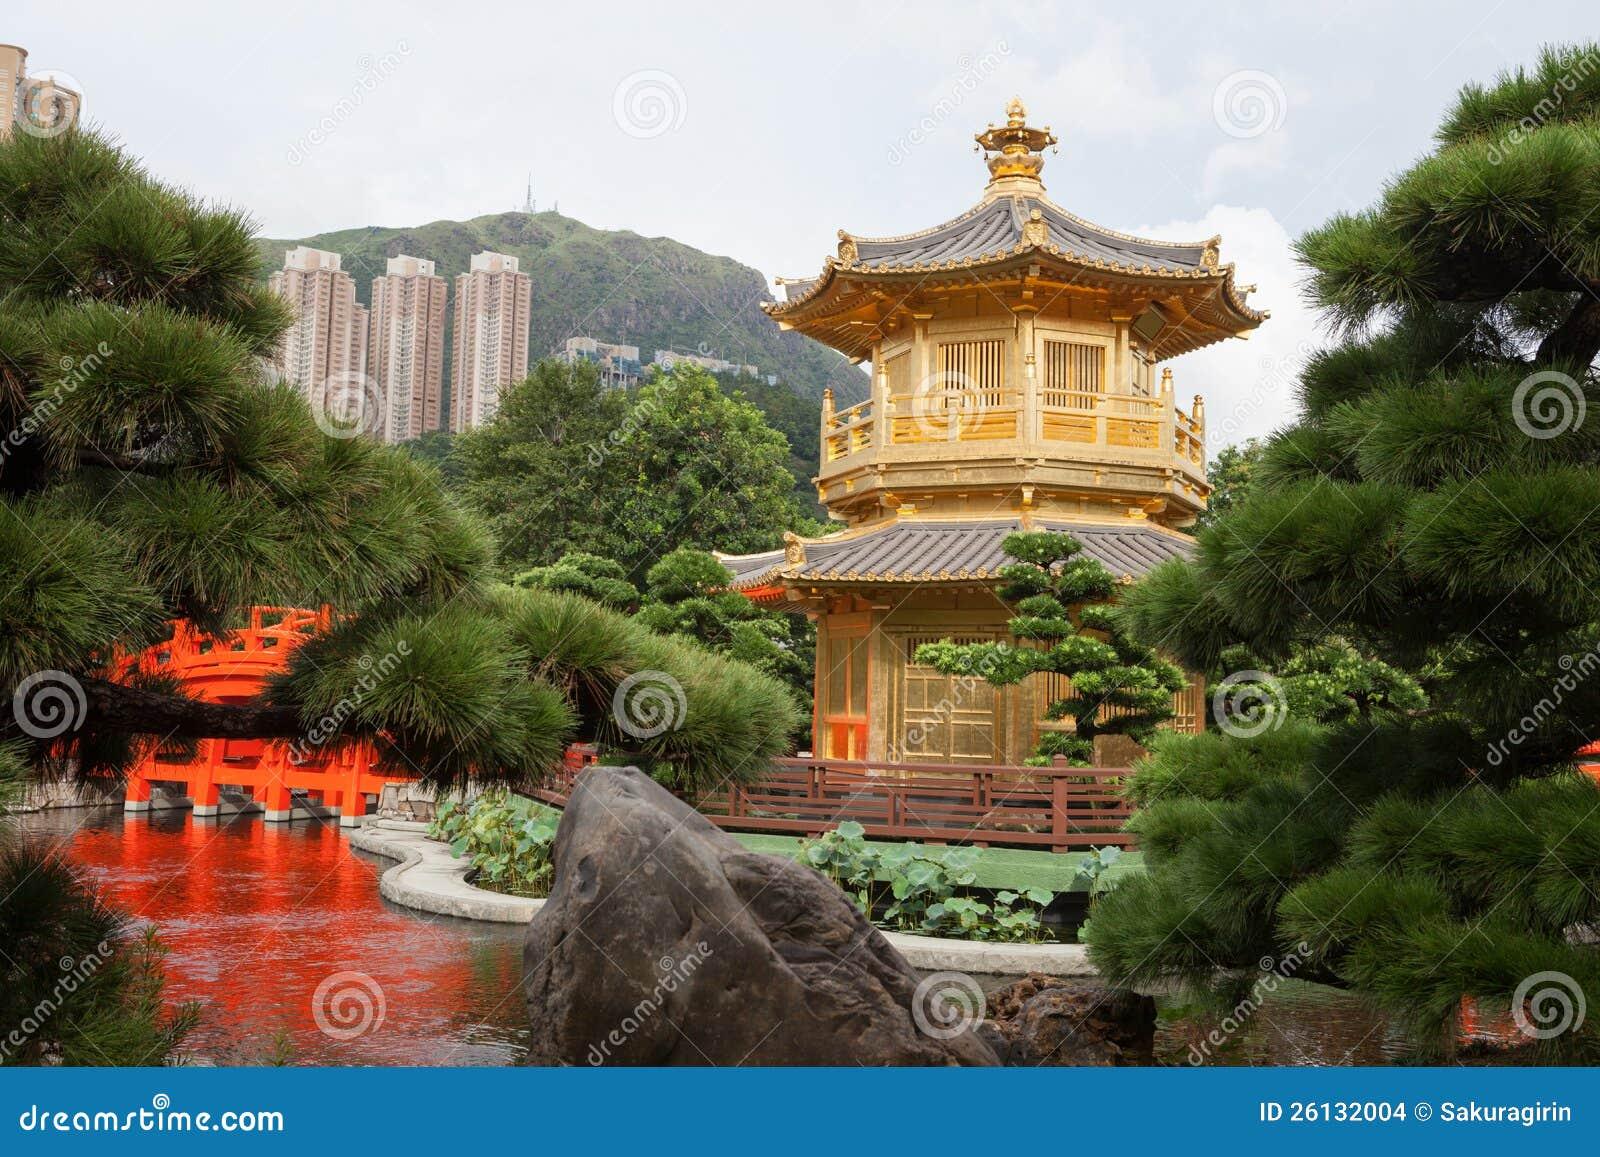 Giardino classico cinese immagini stock immagine 26132004 for Giardino cinese